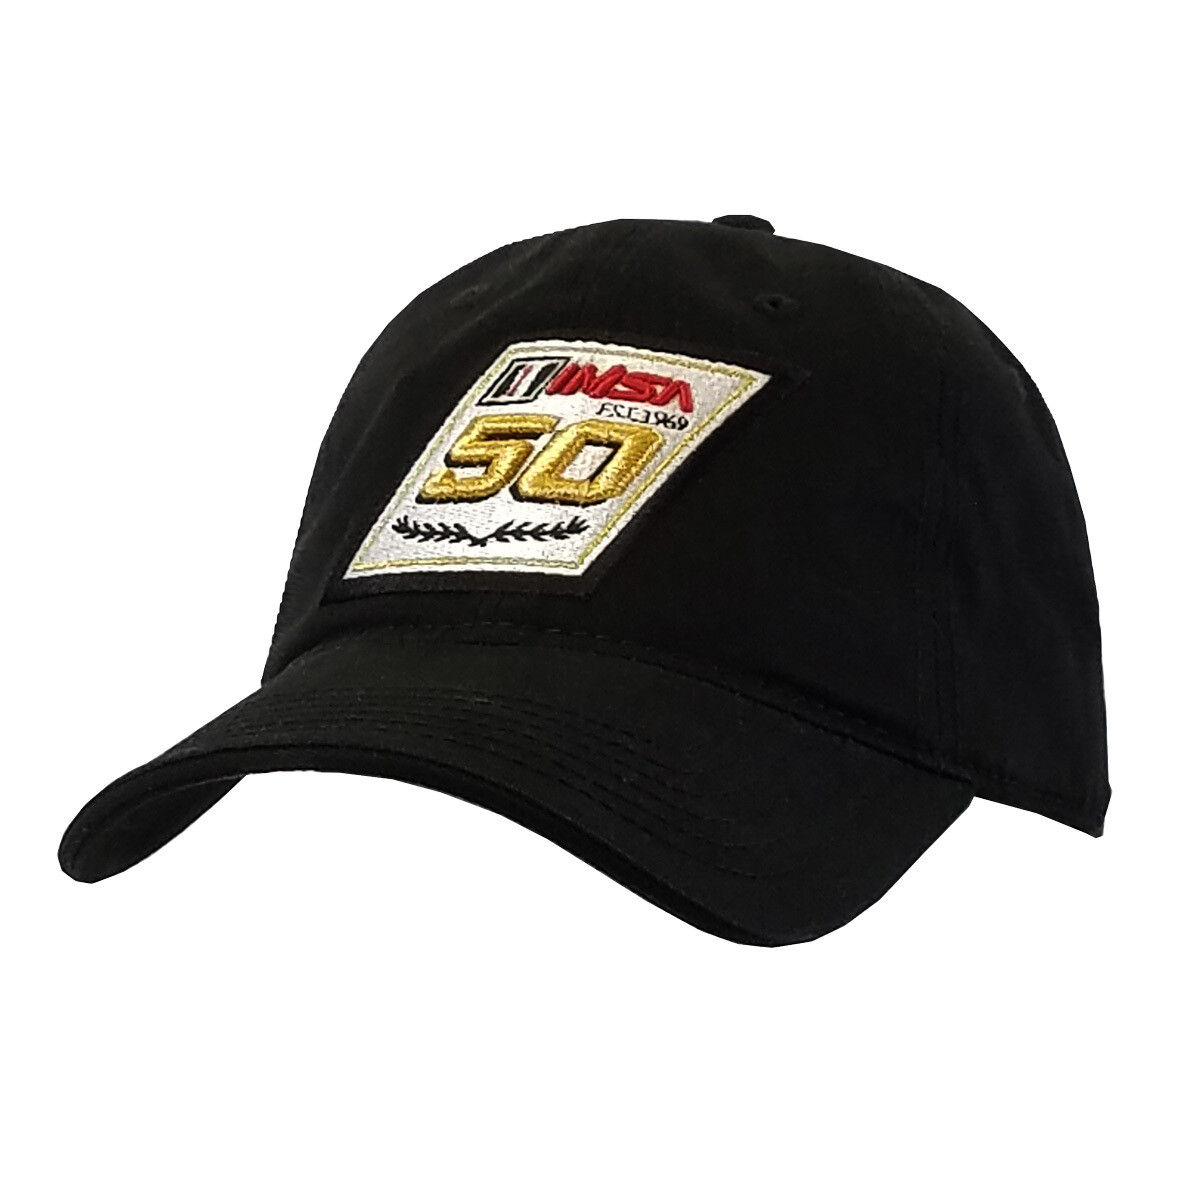 IMSA 50th Anniversary Black Relaxed Hat